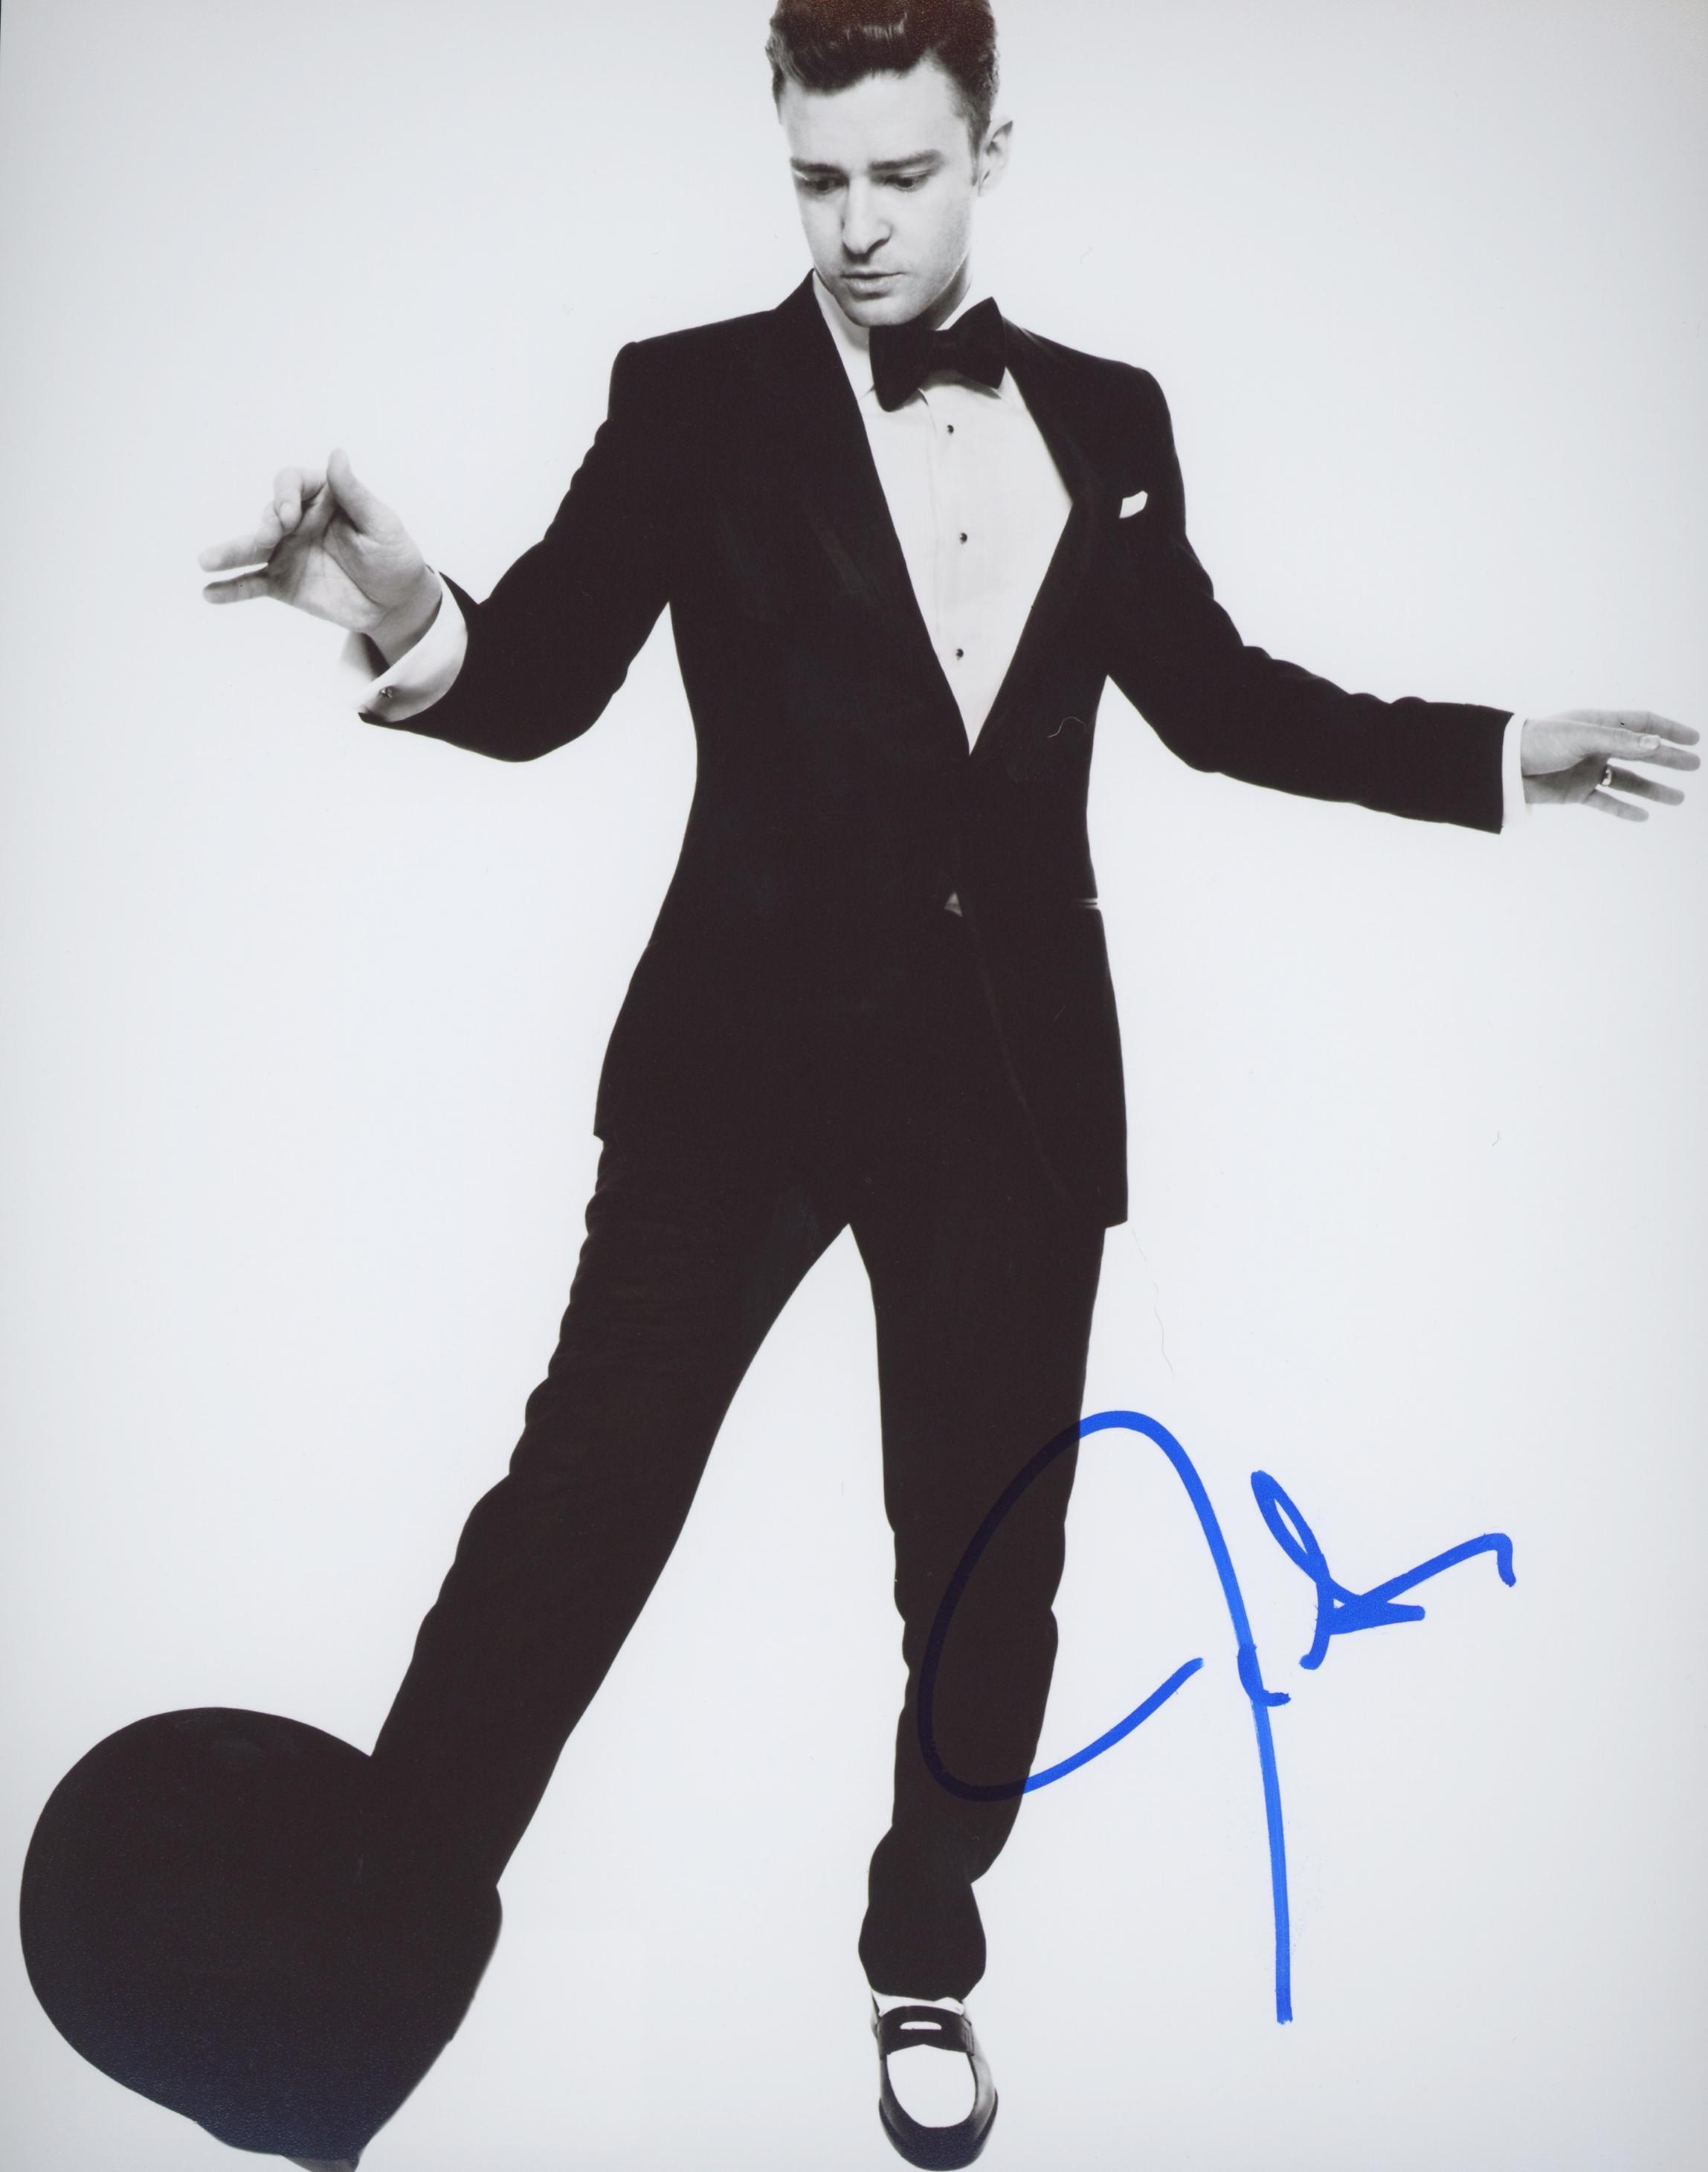 Justin Timberlake Signed Photo